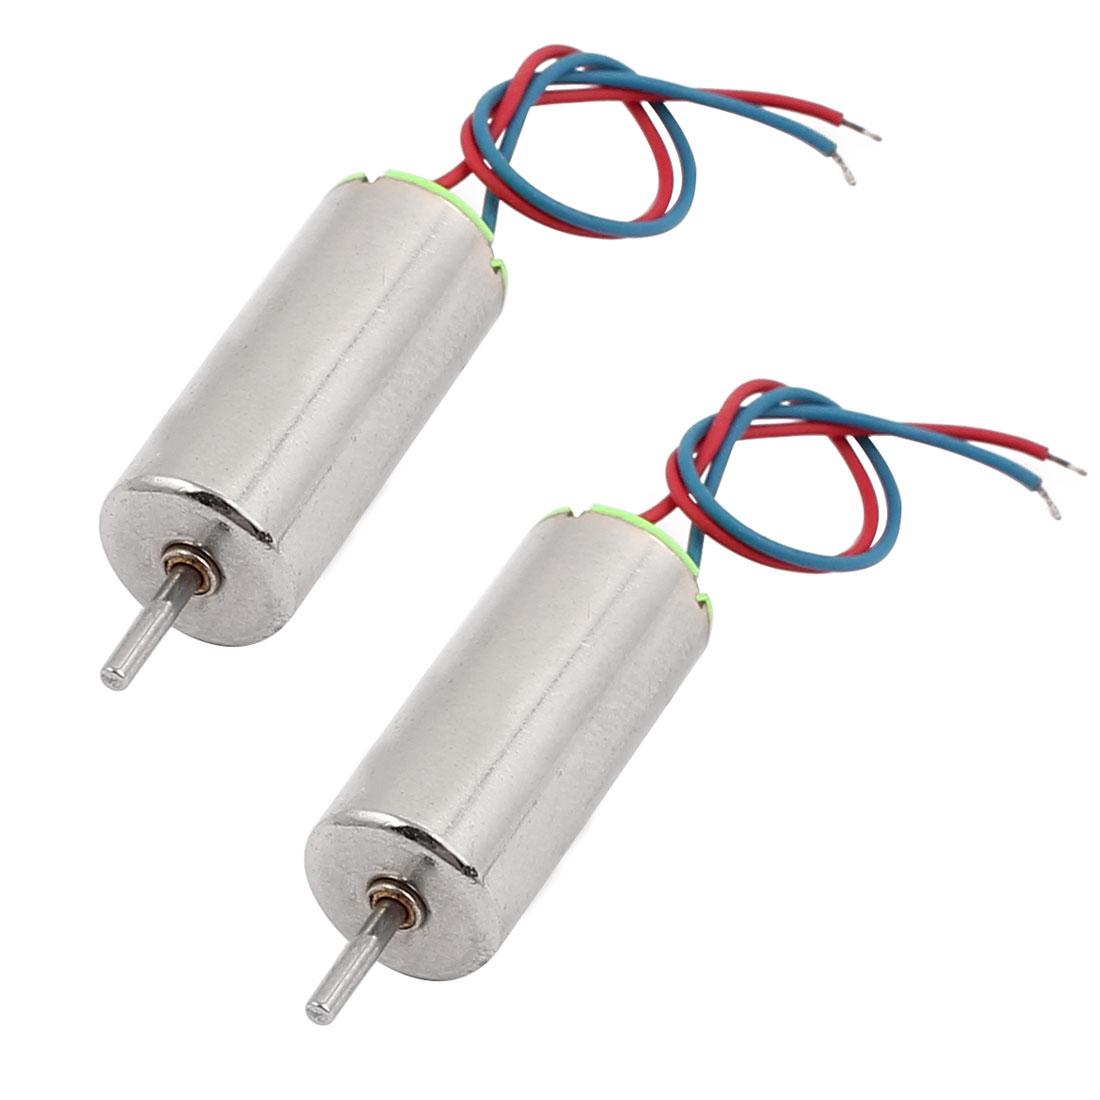 2Pcs DC 1.5V-4.5V 50000RPM High Speed Mini Electric Coreless DC Motor for Model Toys